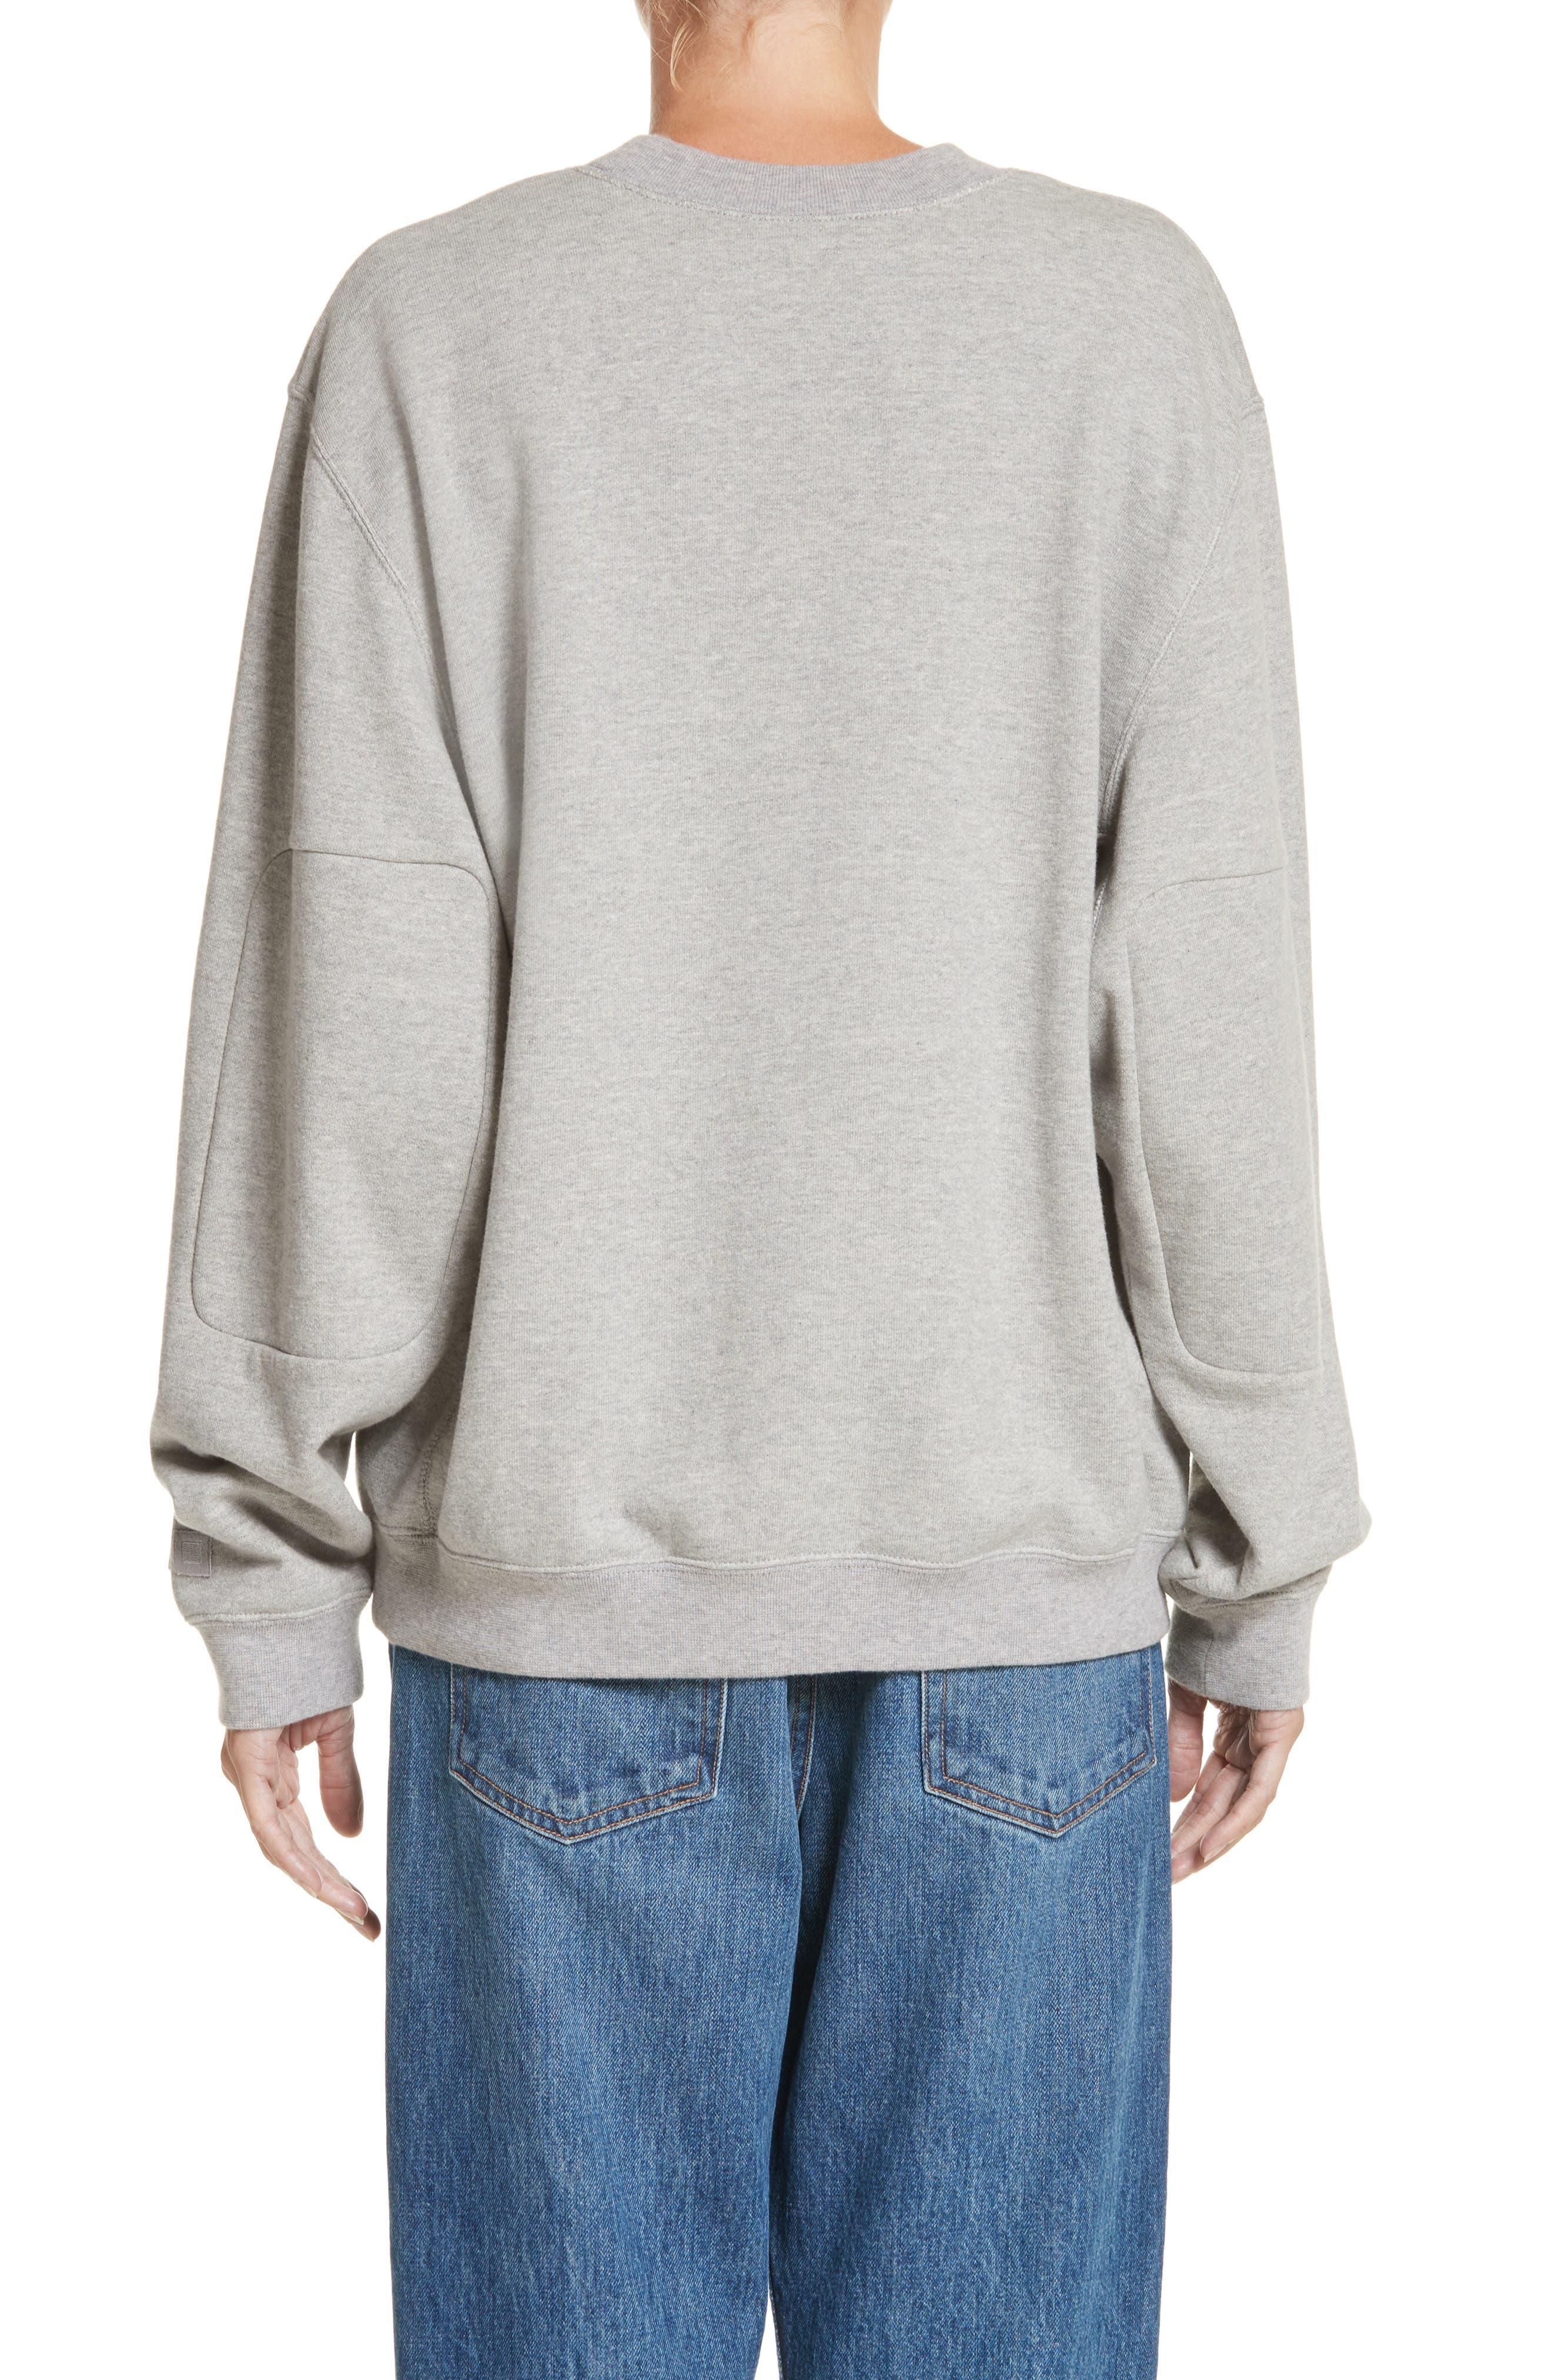 PSWL Graphic Jersey Oversize Sweatshirt,                             Alternate thumbnail 2, color,                             Grey Melange/ White Logo